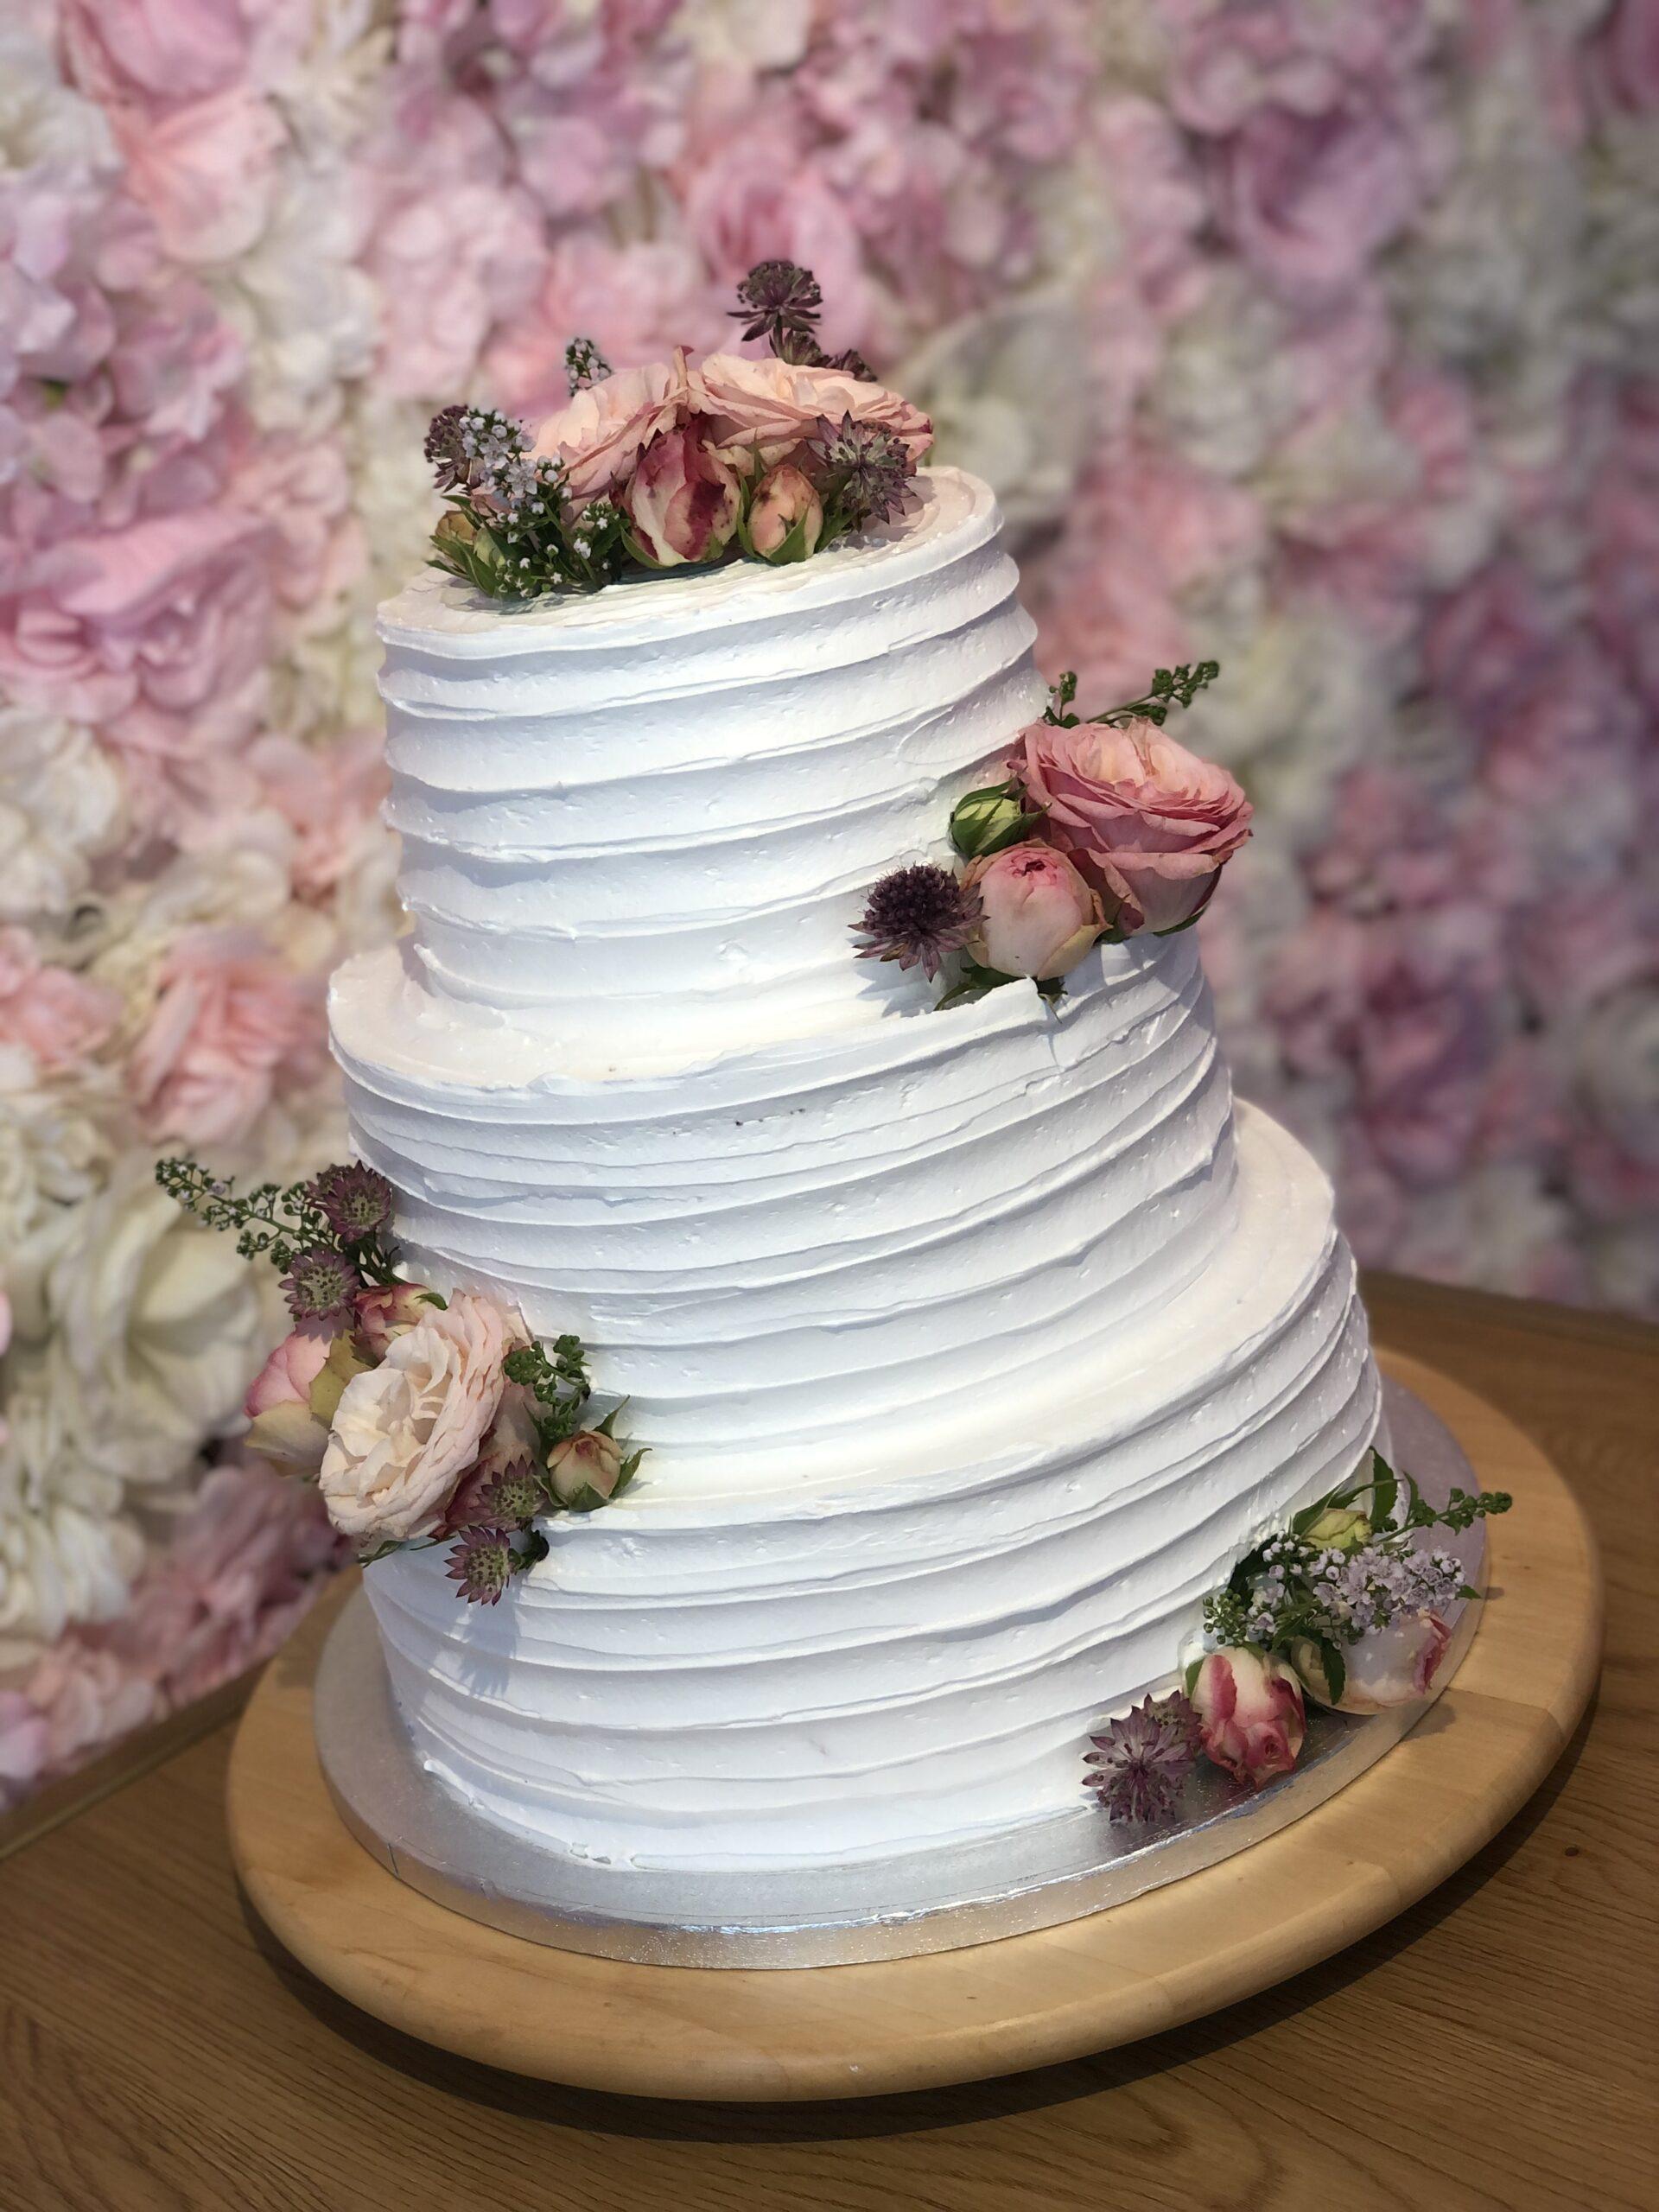 Bryllupskage Etagekage Stakket kage